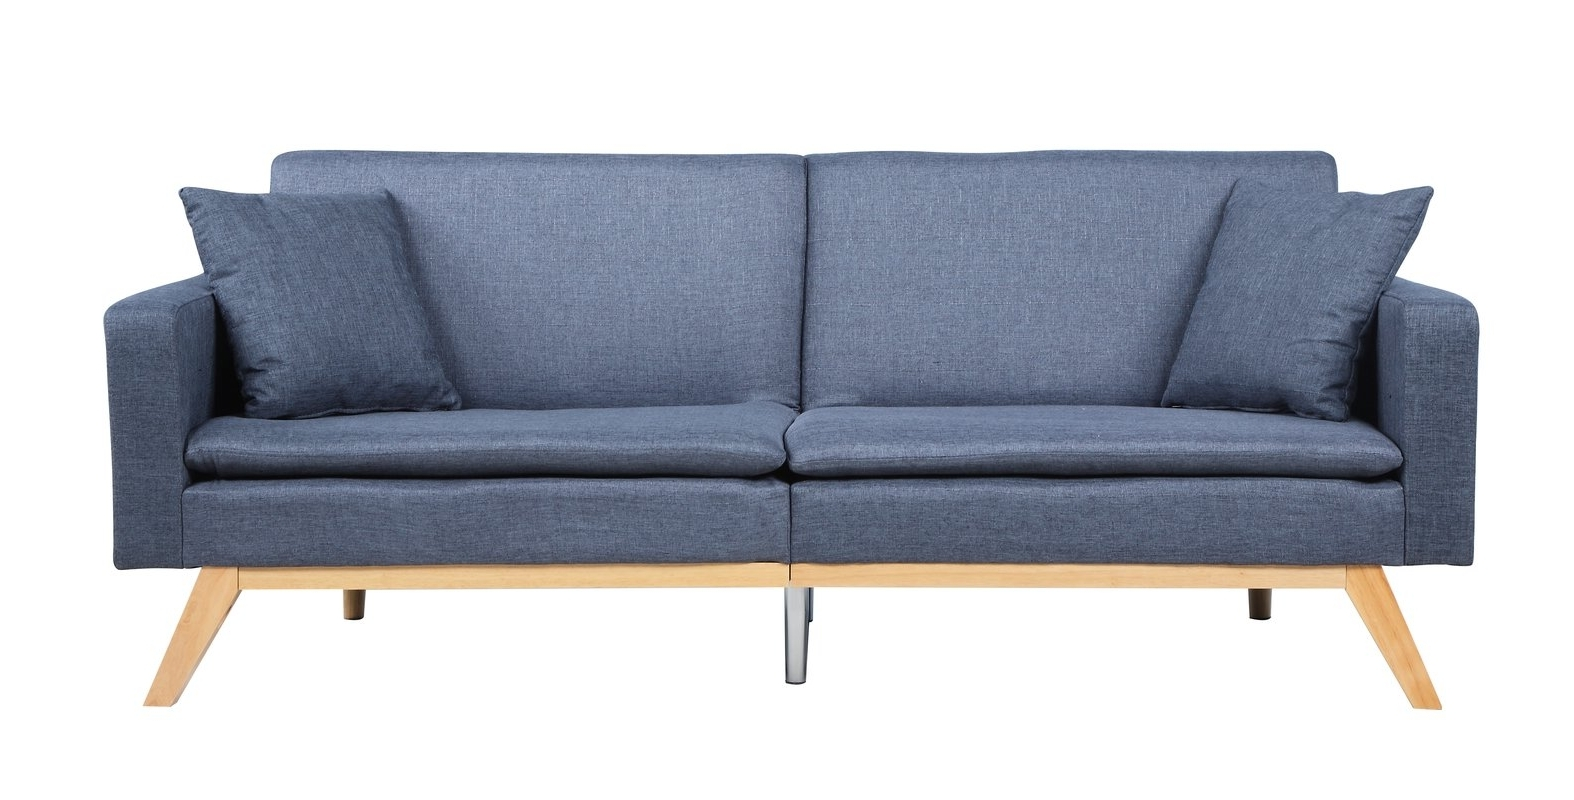 Newest Tufted Linen Sofas Inside Madison Home Usa Modern Tufted Linen Splitback Recliner Sofa (View 7 of 15)